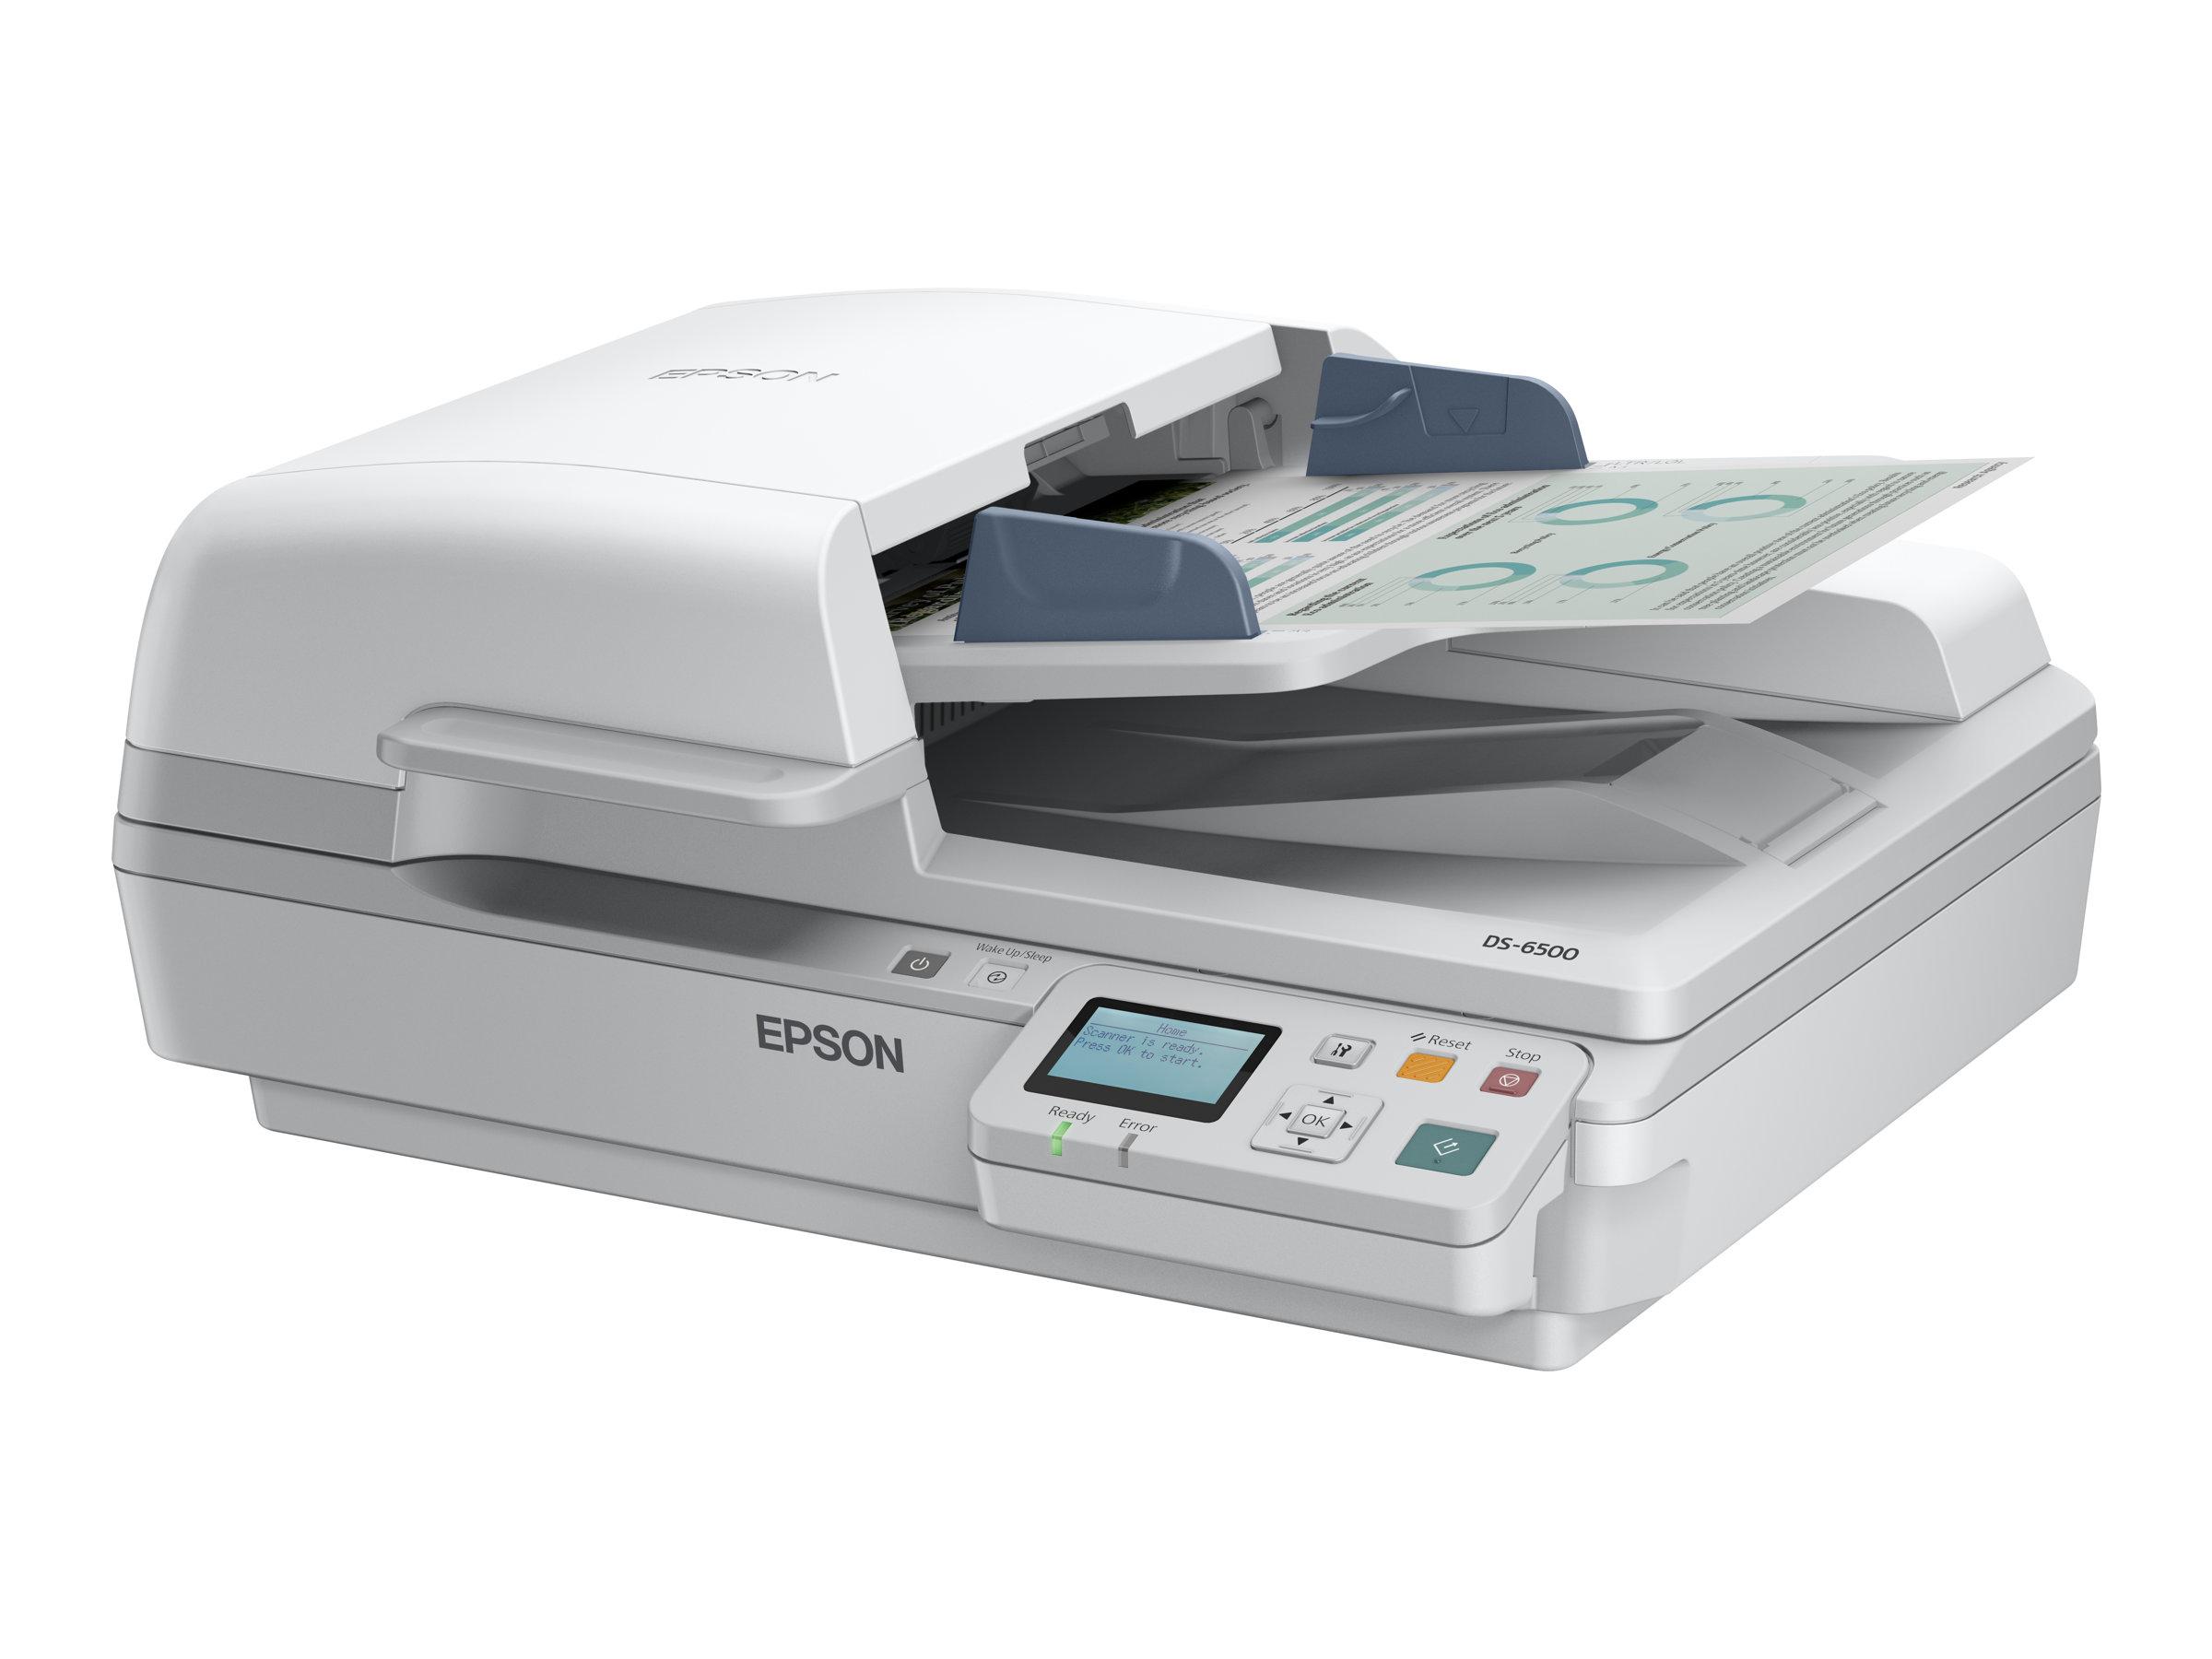 Epson WorkForce DS-7500N - Dokumentenscanner